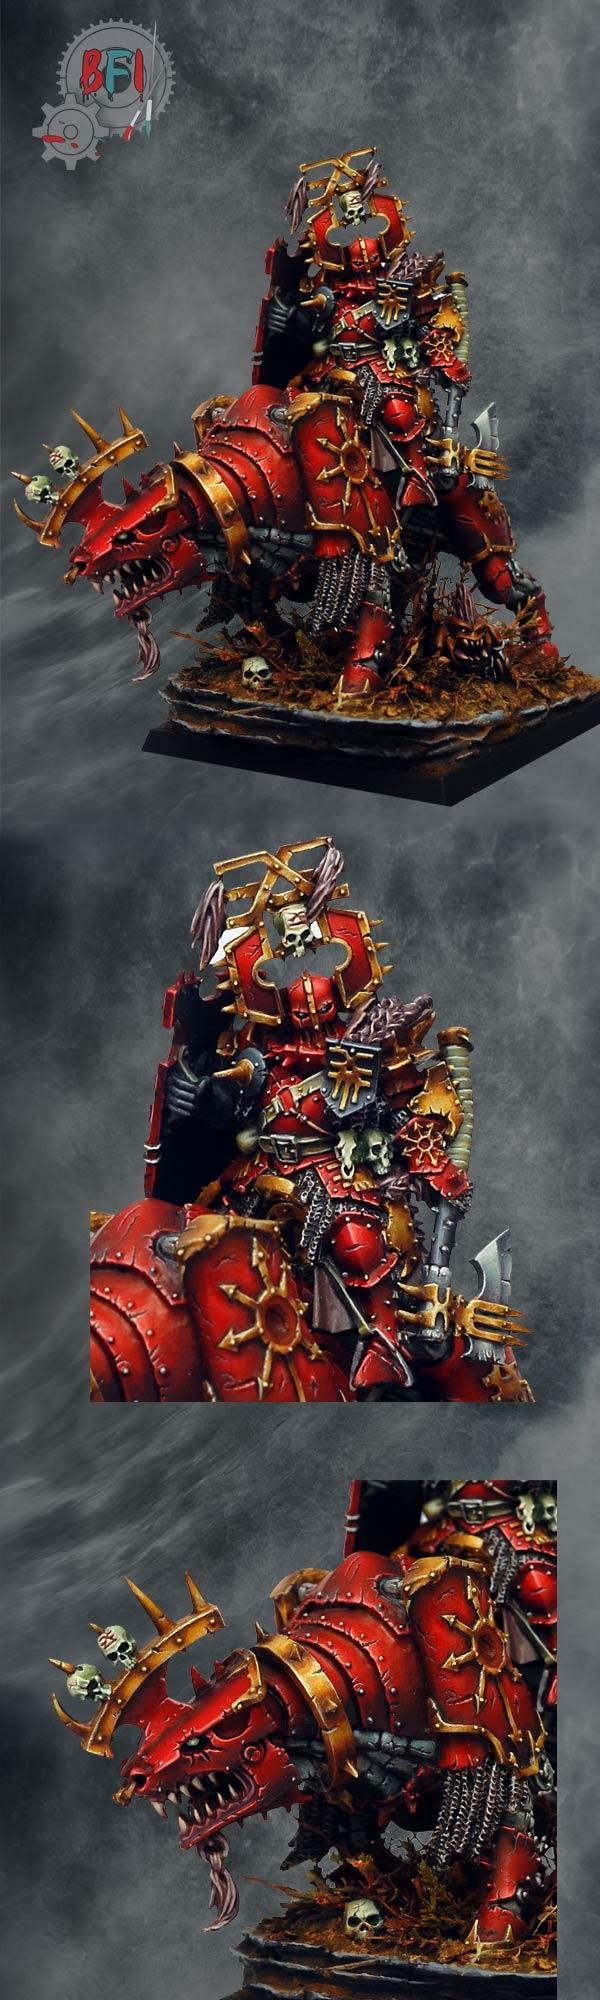 Lord of Khorne on Juggernaut closeups